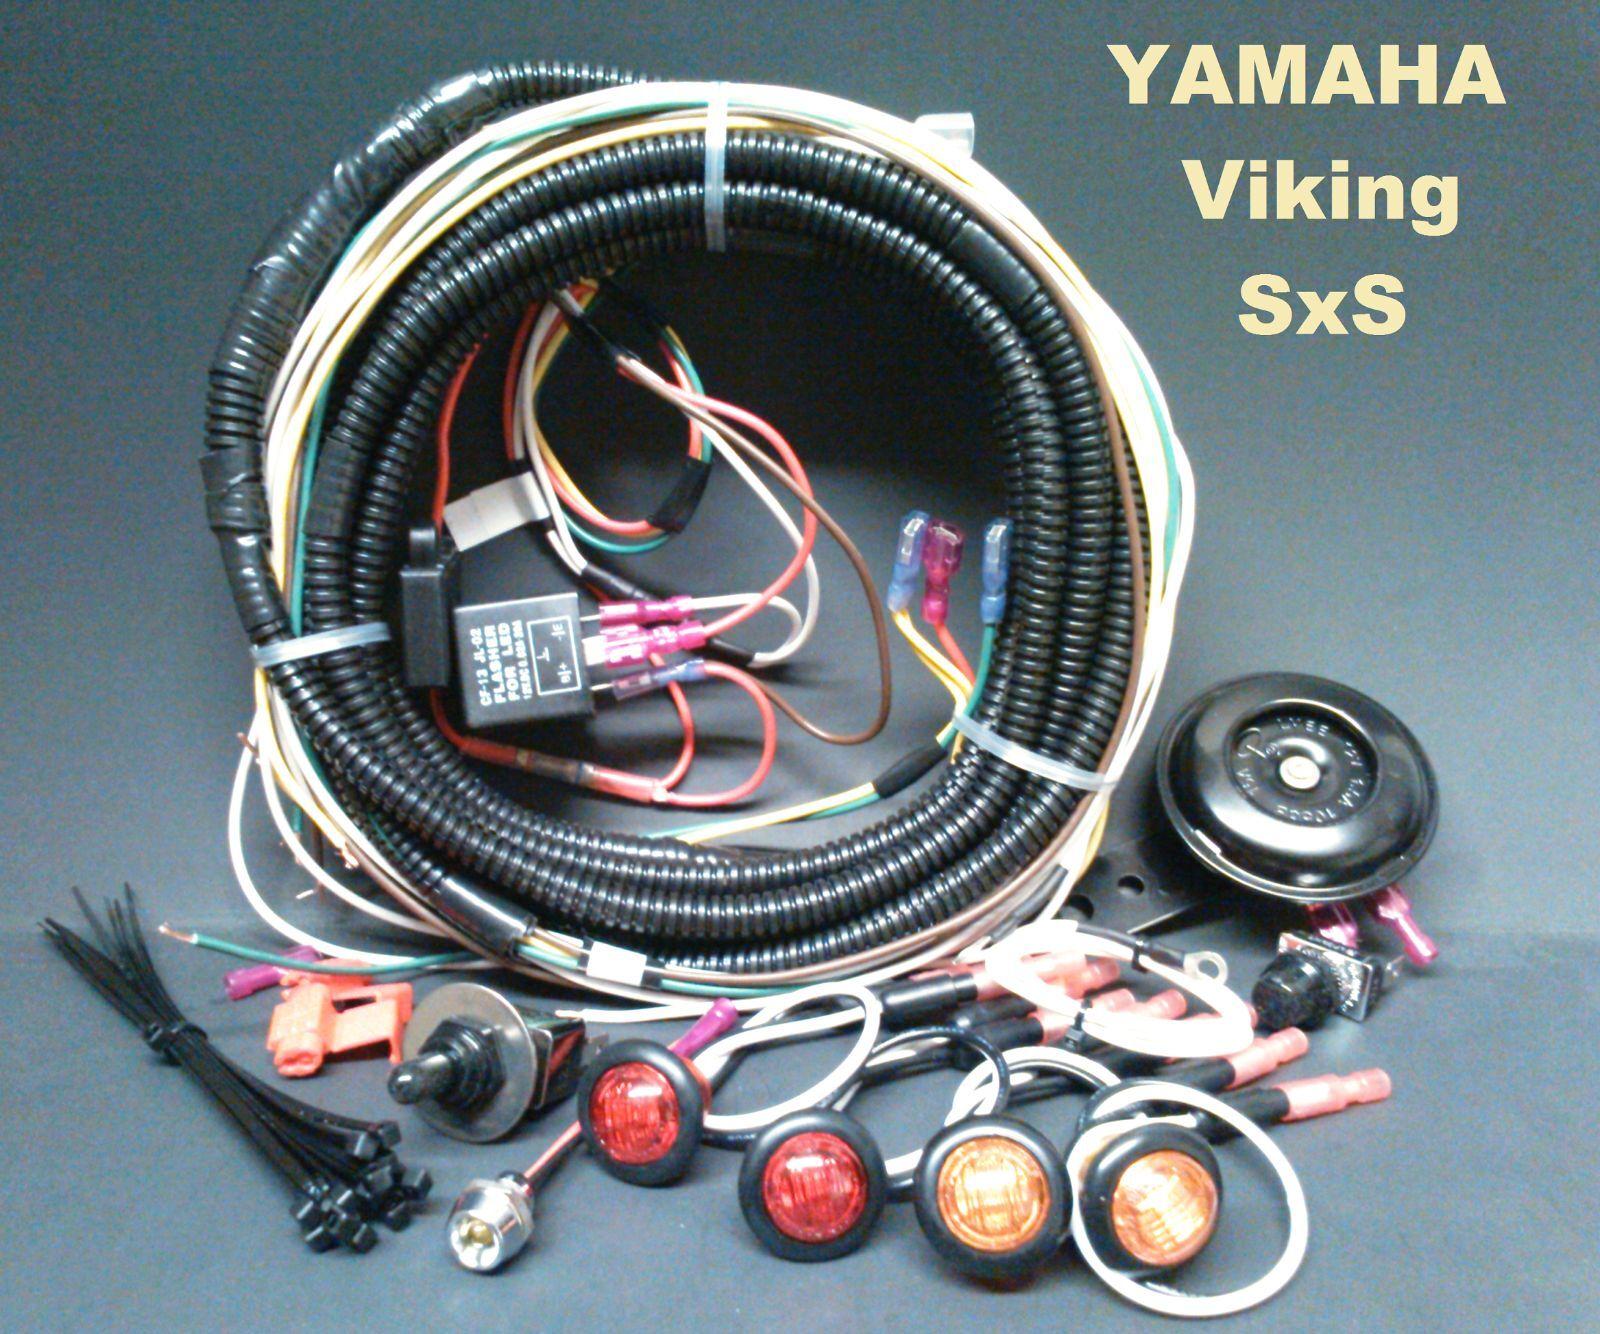 yamaha viking turn signal horn kit sealed loomed wiring harness you re almost done yamaha viking